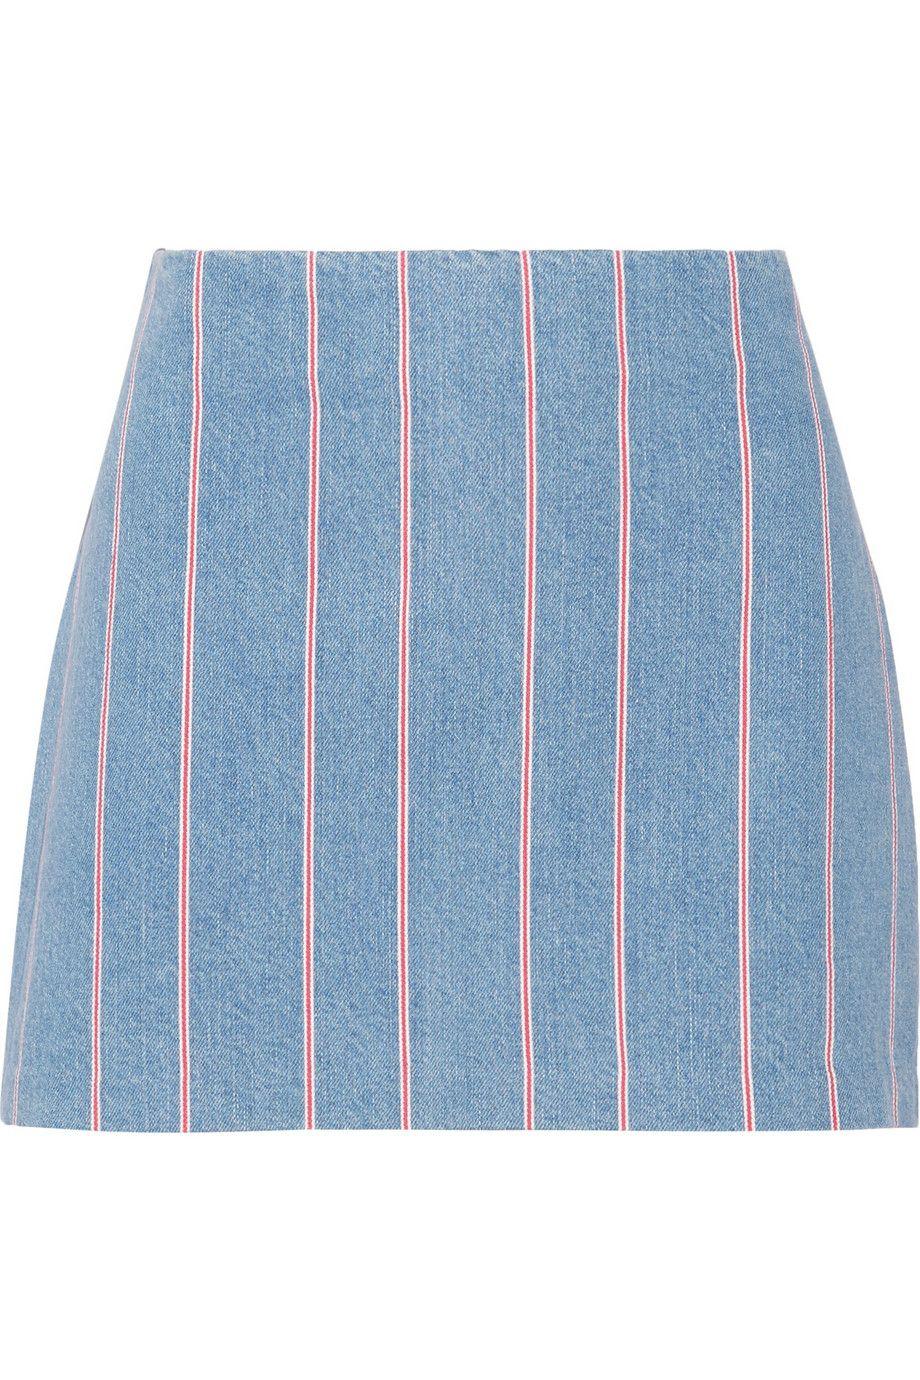 "T by Alexander Wang Striped Denim Mini Skirt, $225; &lt;a target=""_blank"" href=""http://rstyle.me/n/yihh5bc6jf""&gt;net-a-porter.com&lt;/a&gt;   <!--EndFragment-->"